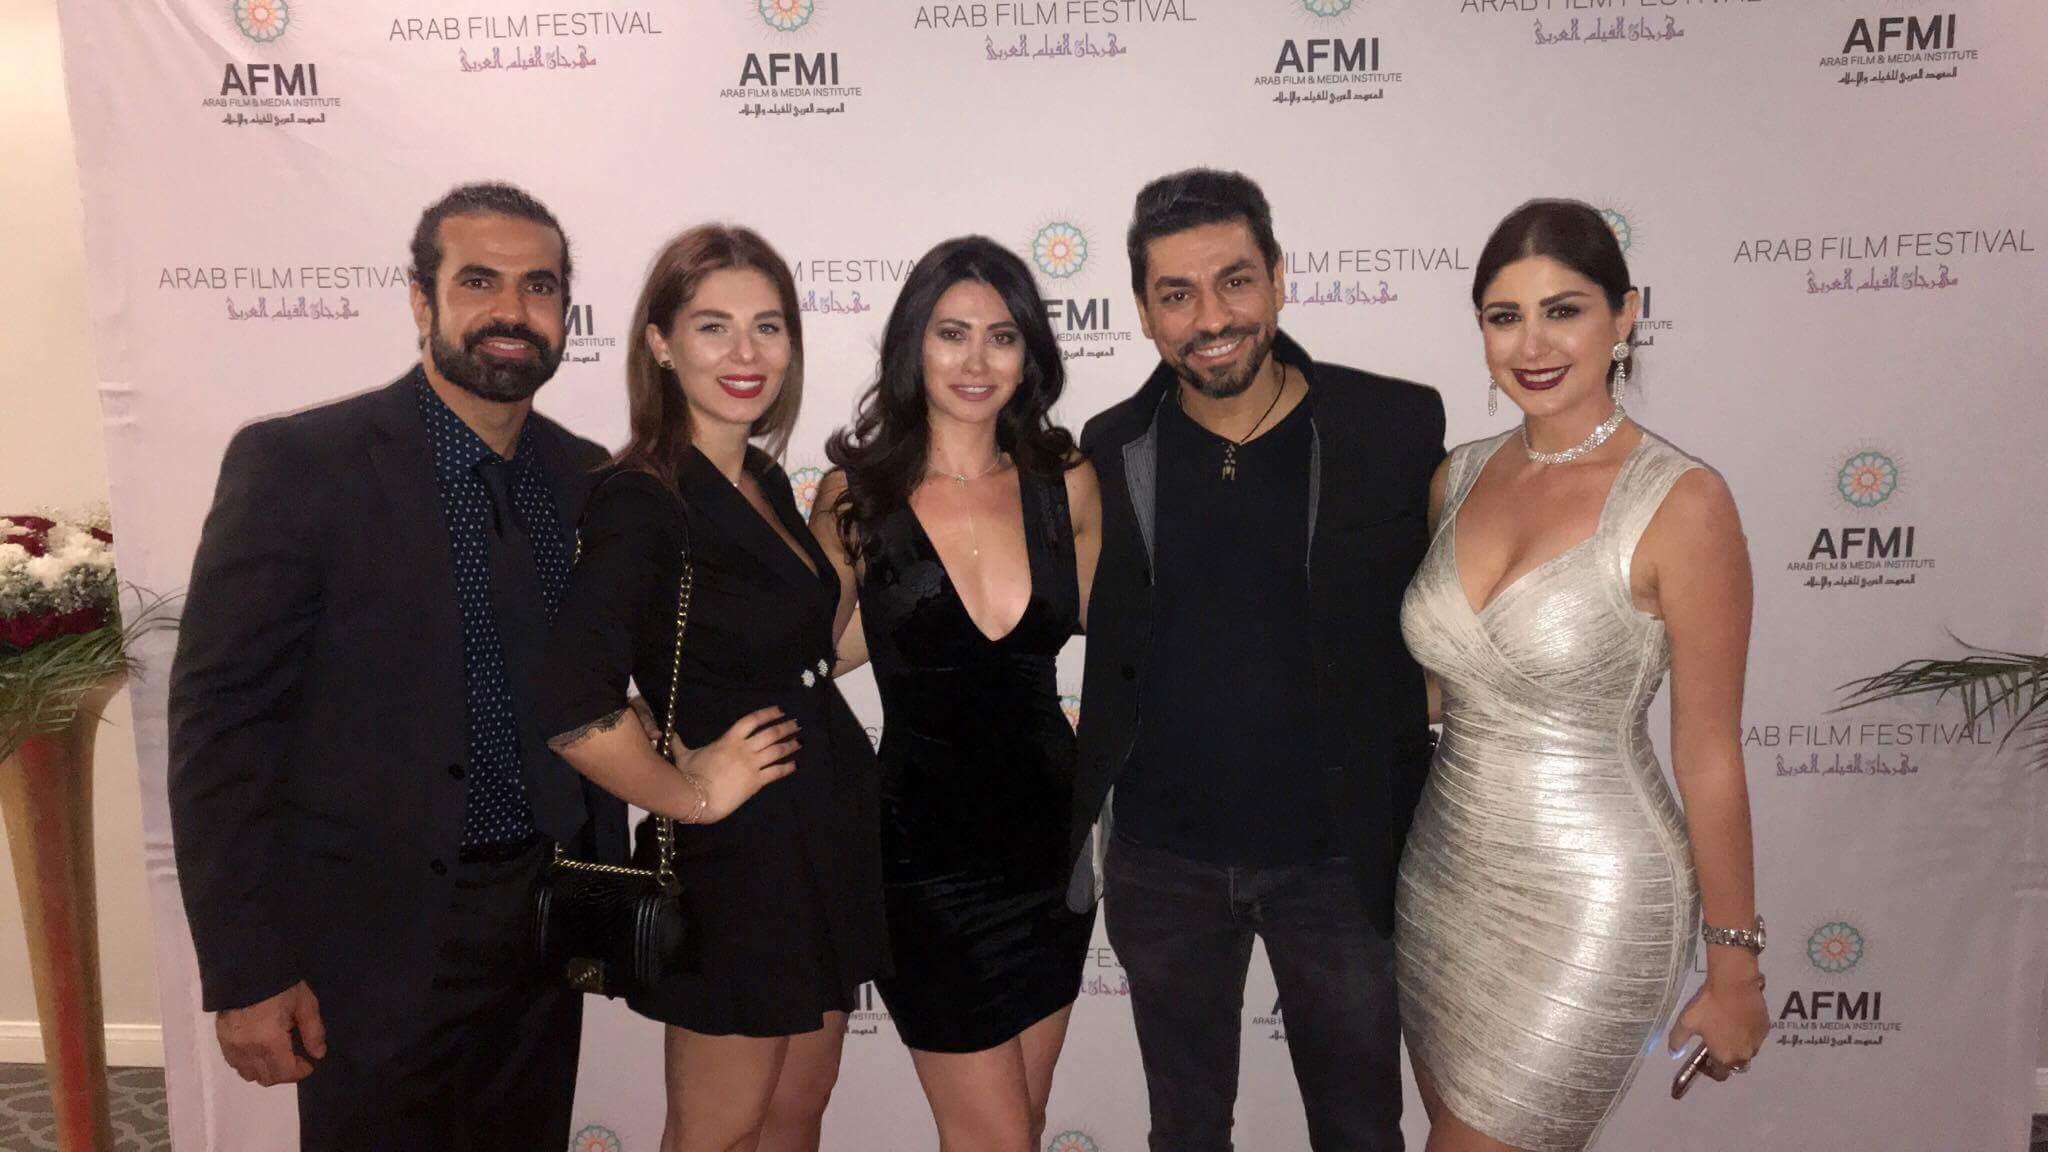 at Arab Film Festival - Los Angeles